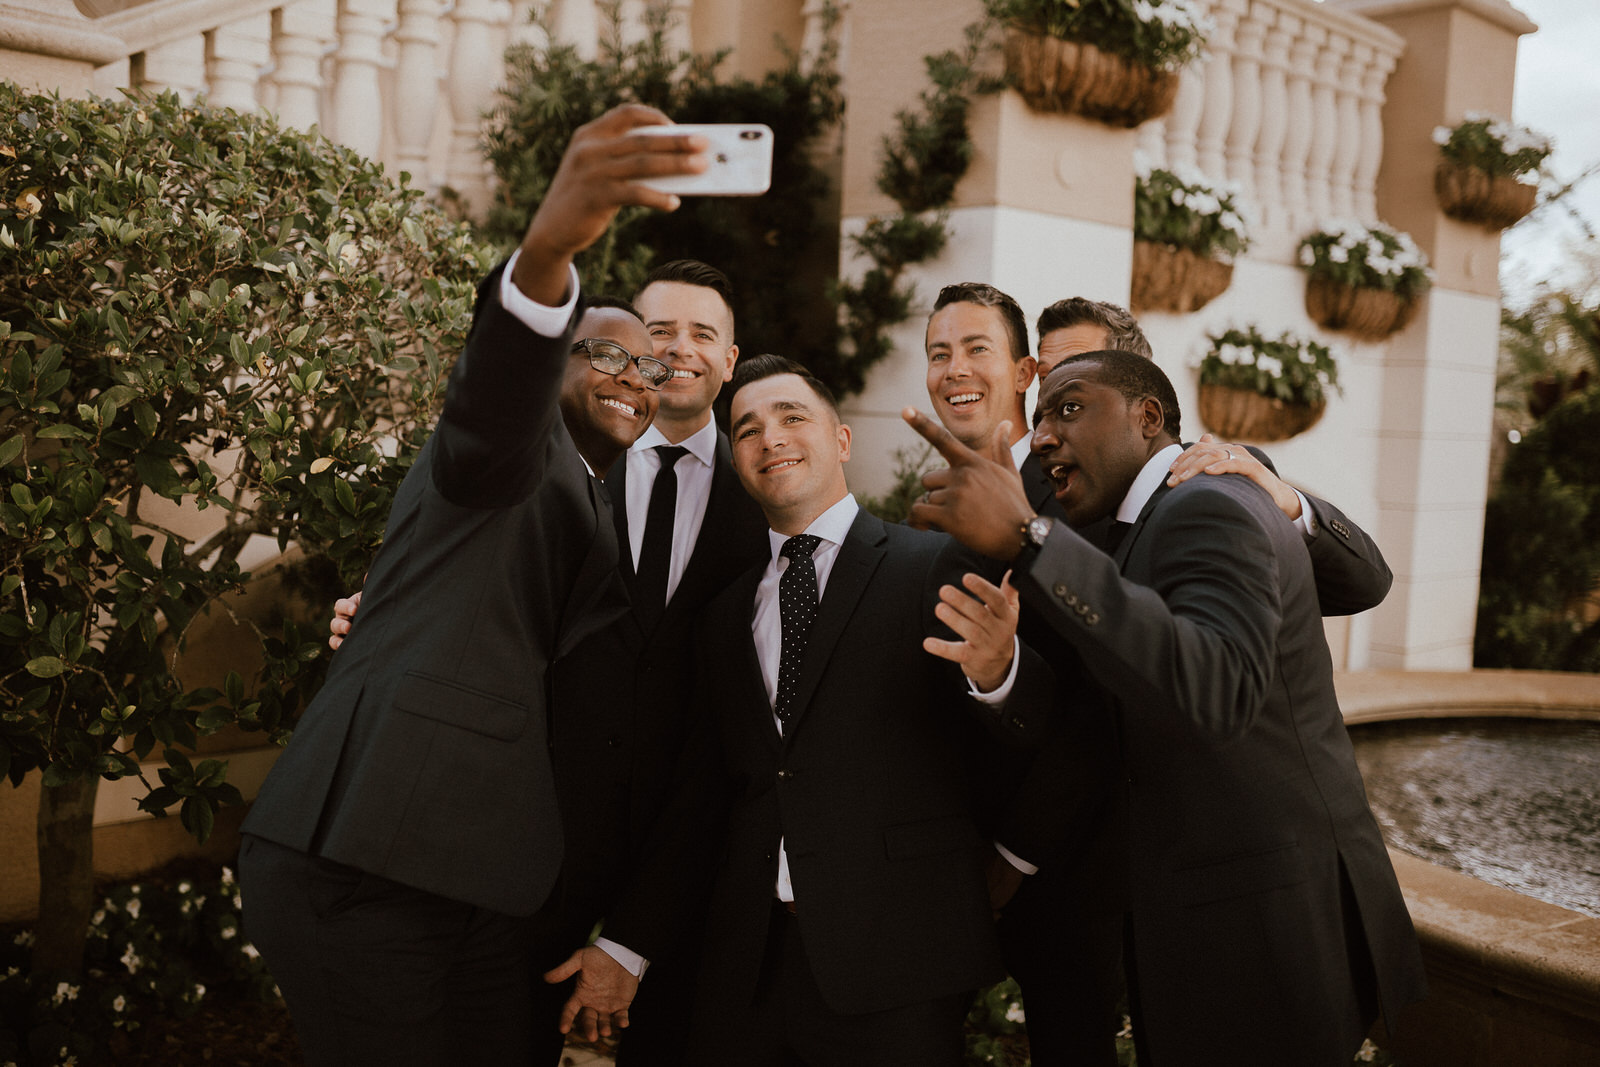 Club at the Strand Wedding- Naples Florida Wedding Photographer- Michelle Gonzalez Photography- Desiree and Bryan-602.JPG